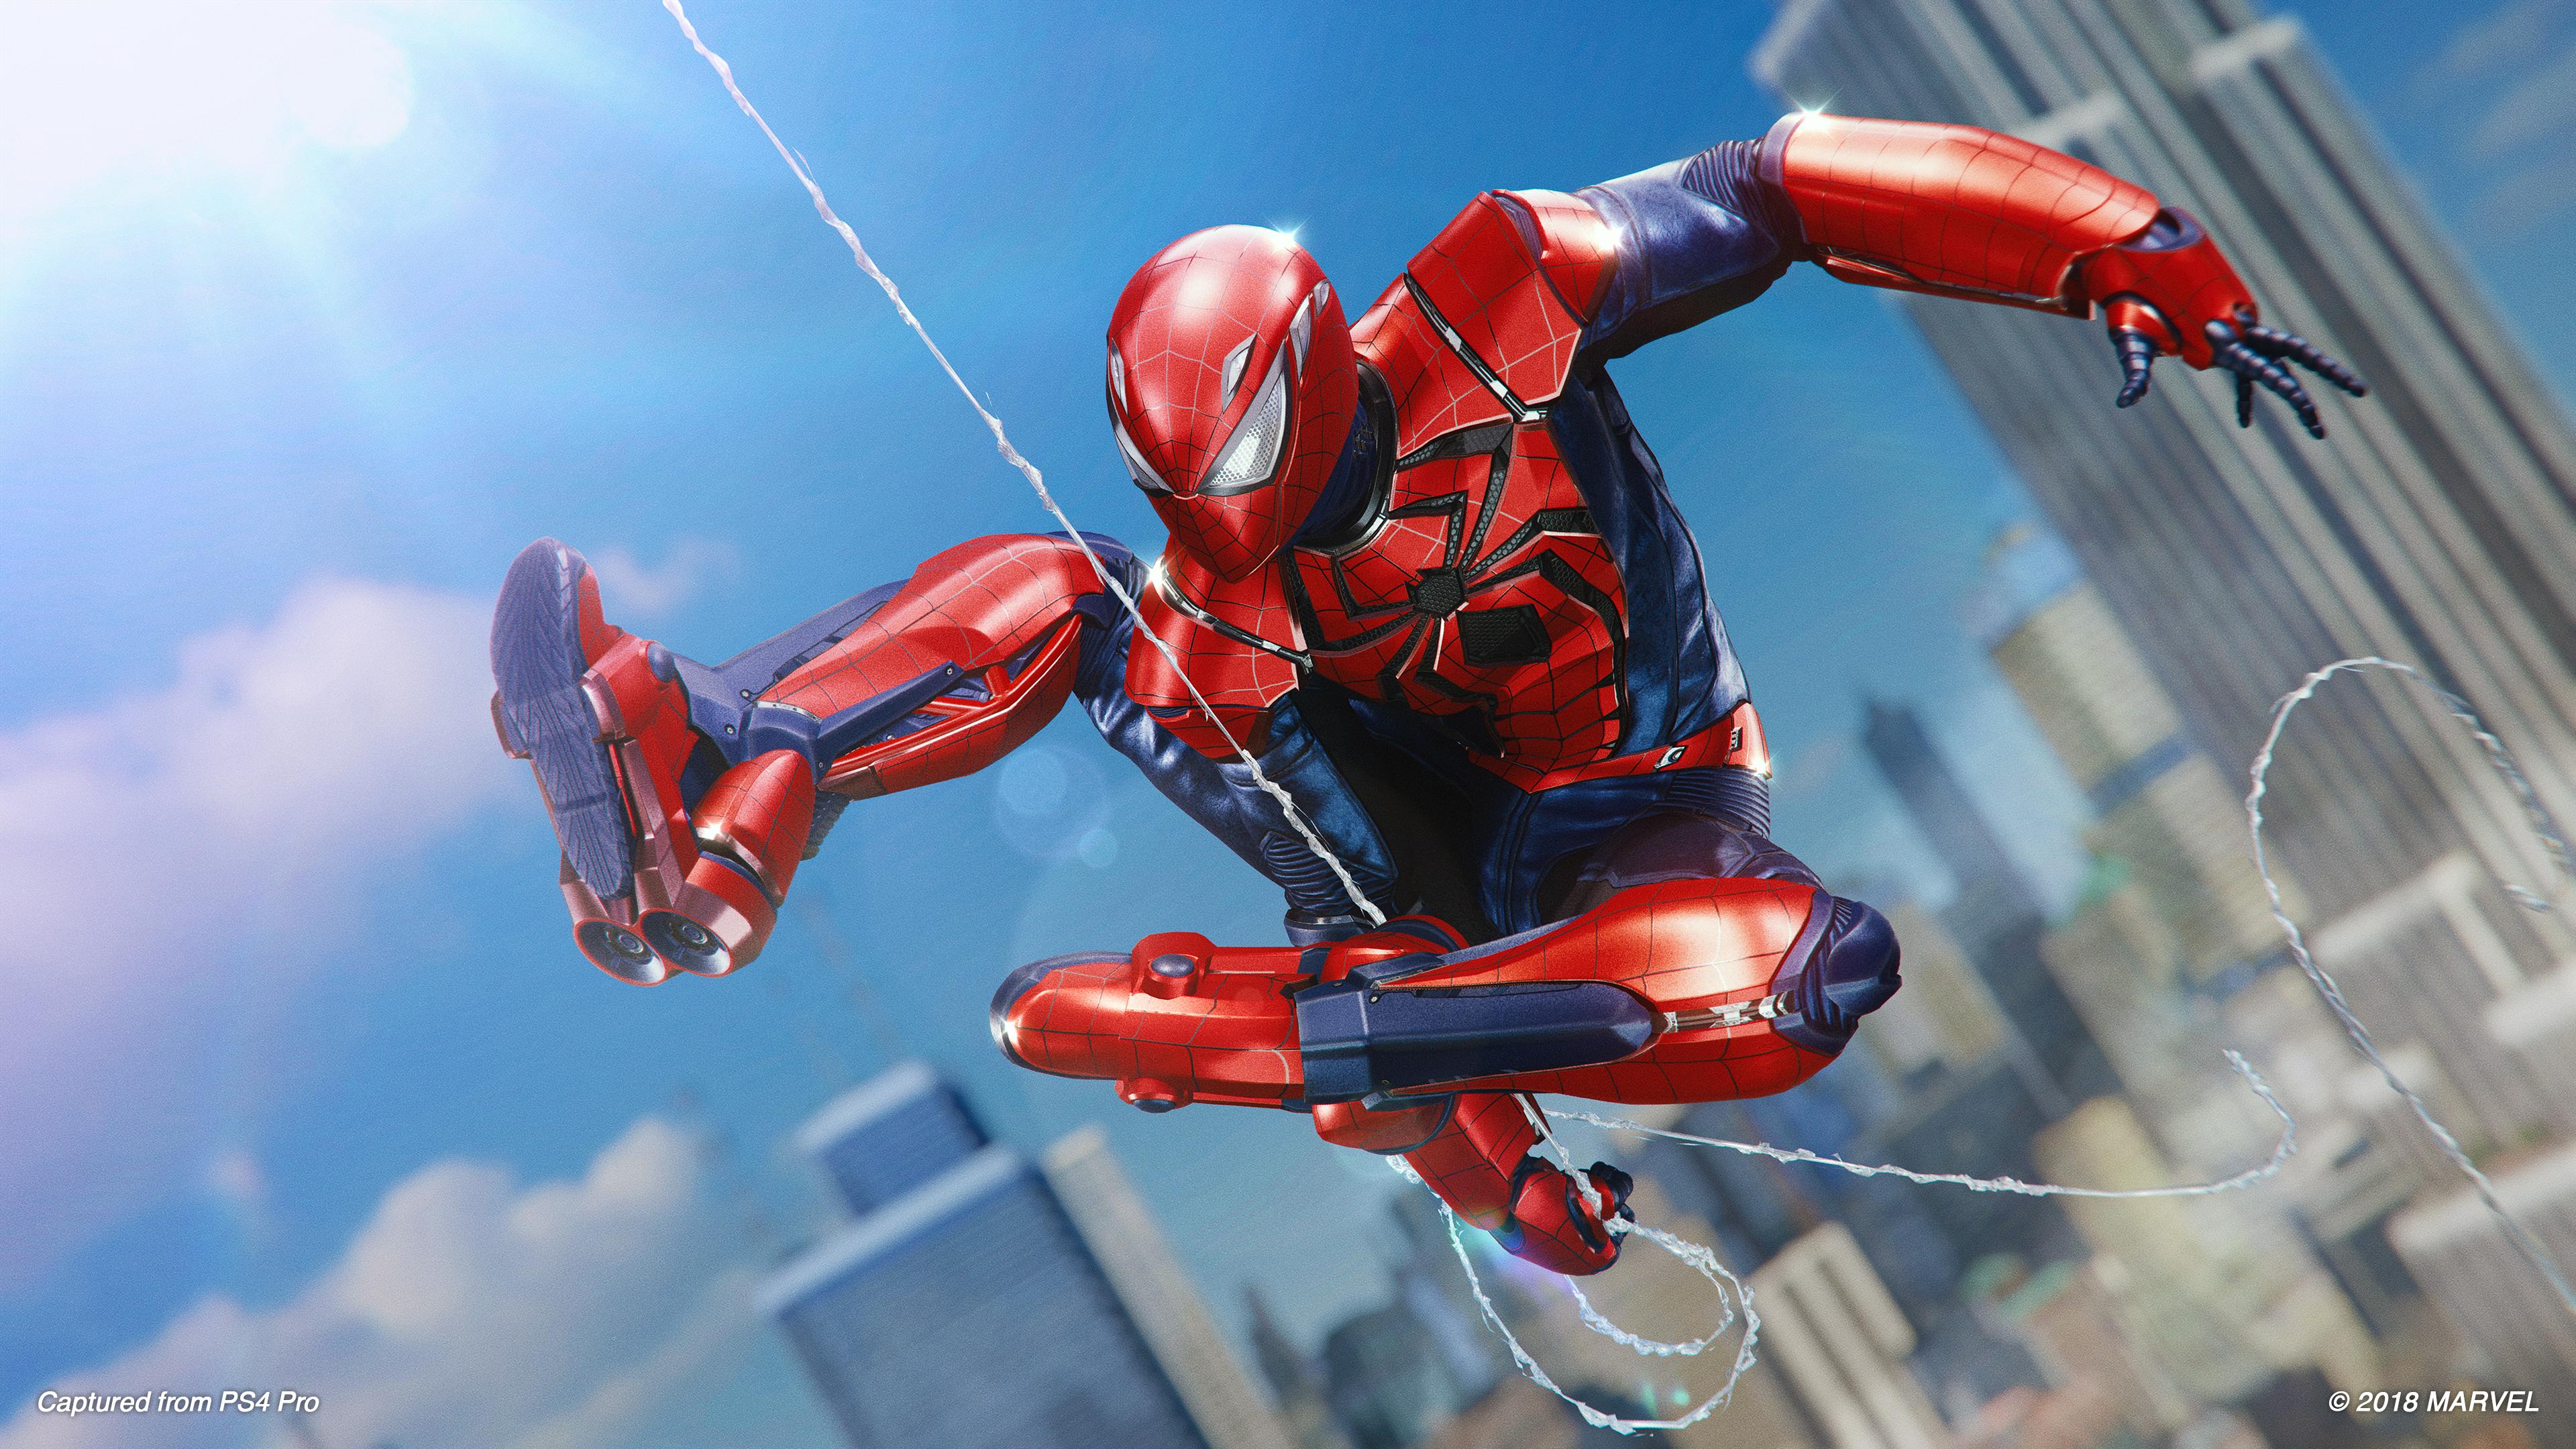 Луч надежды - Marvel's Spider-Man 4K, DLC